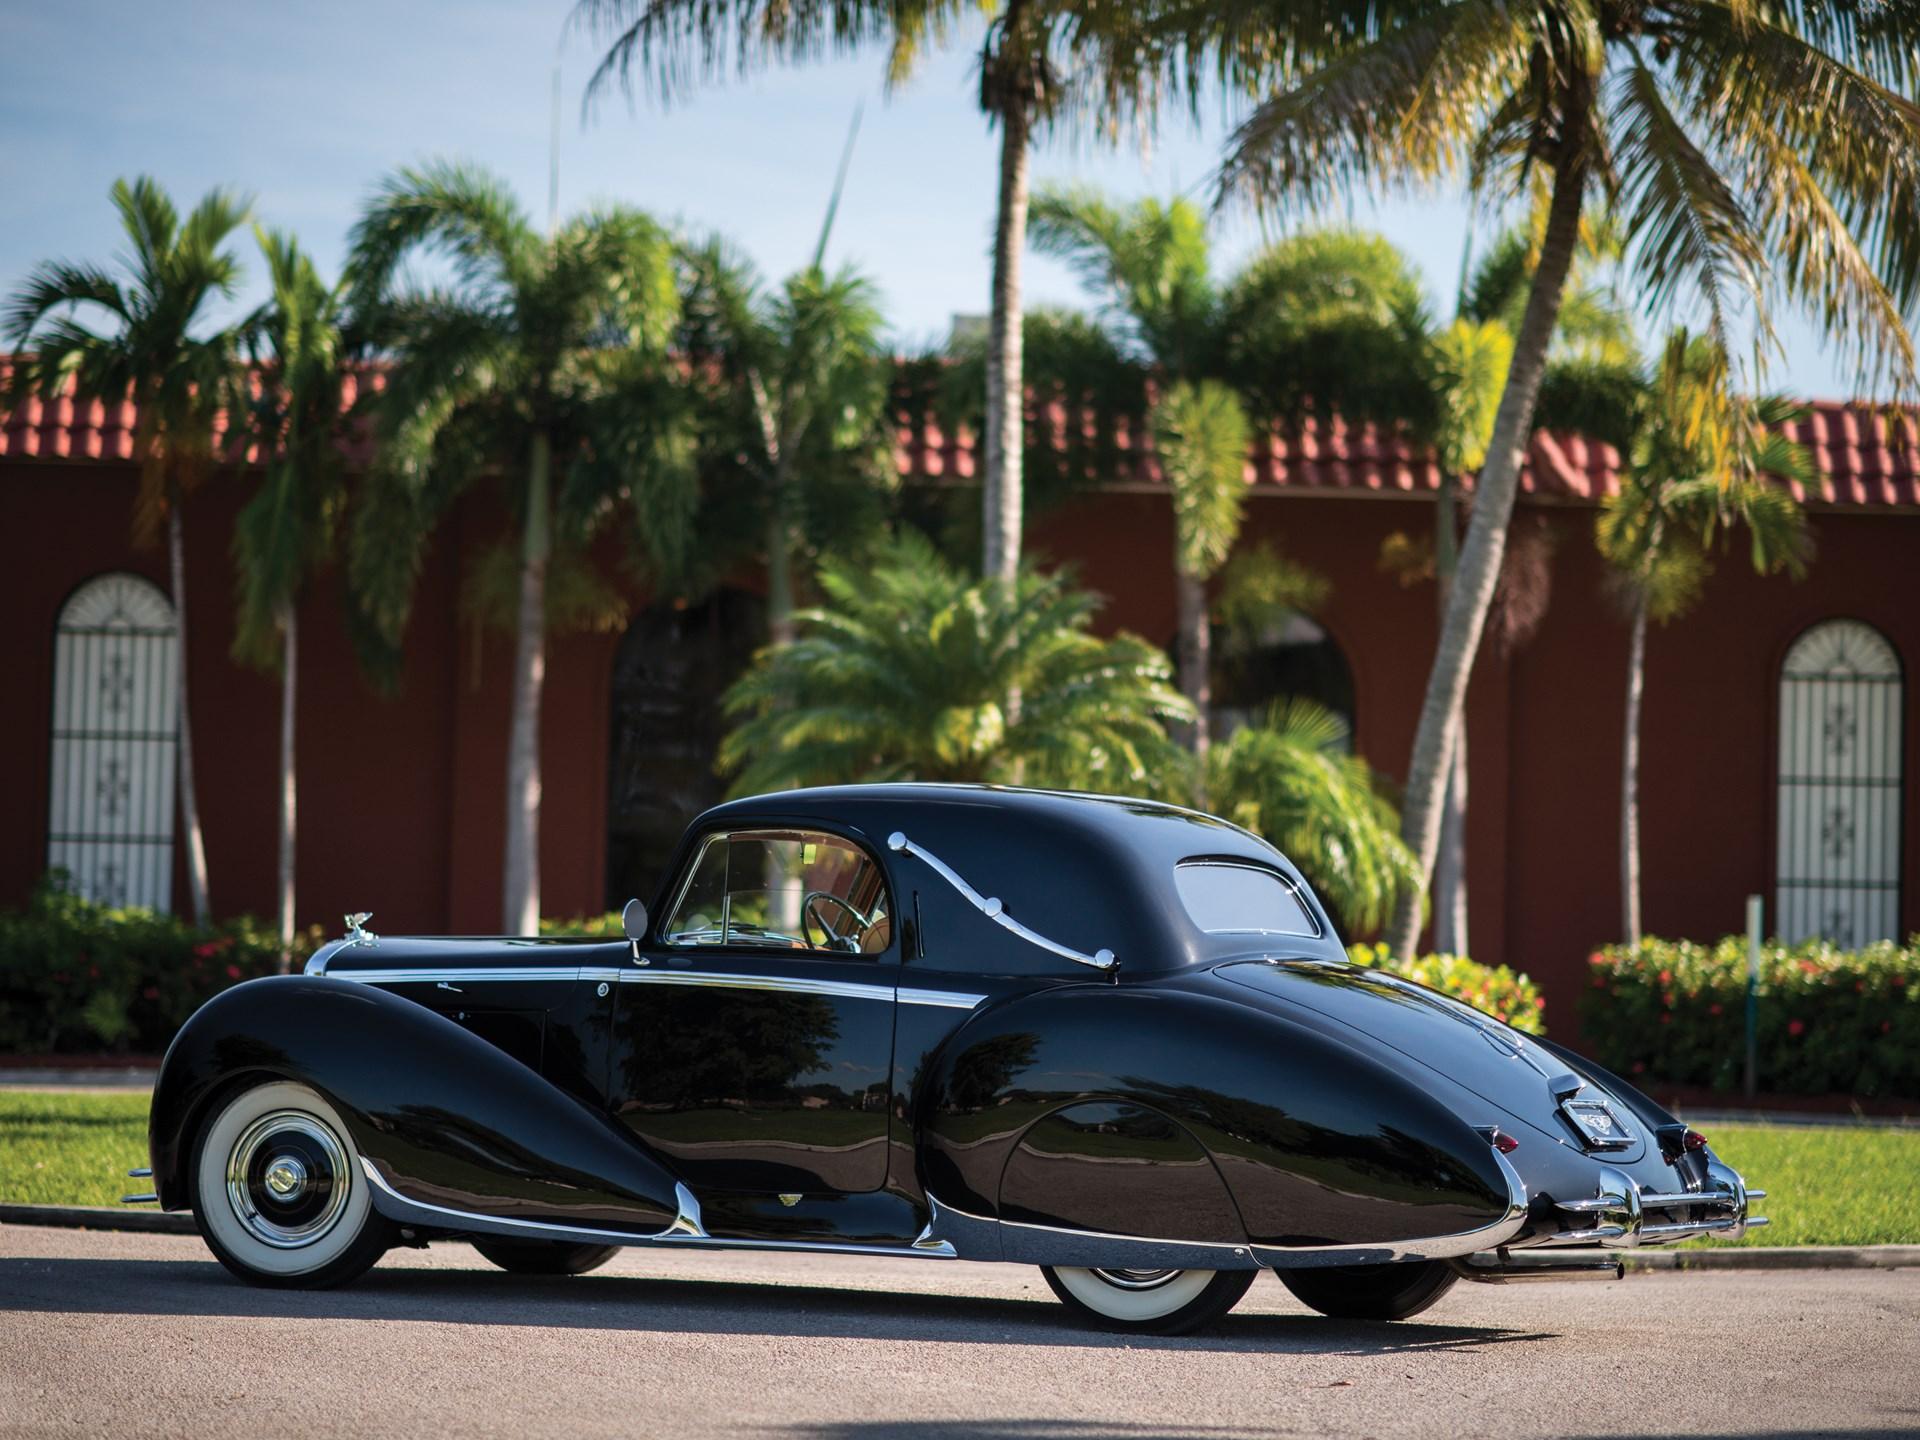 RM Sotheby's - 1947 Bentley Mark VI Fixed Head Coupé by